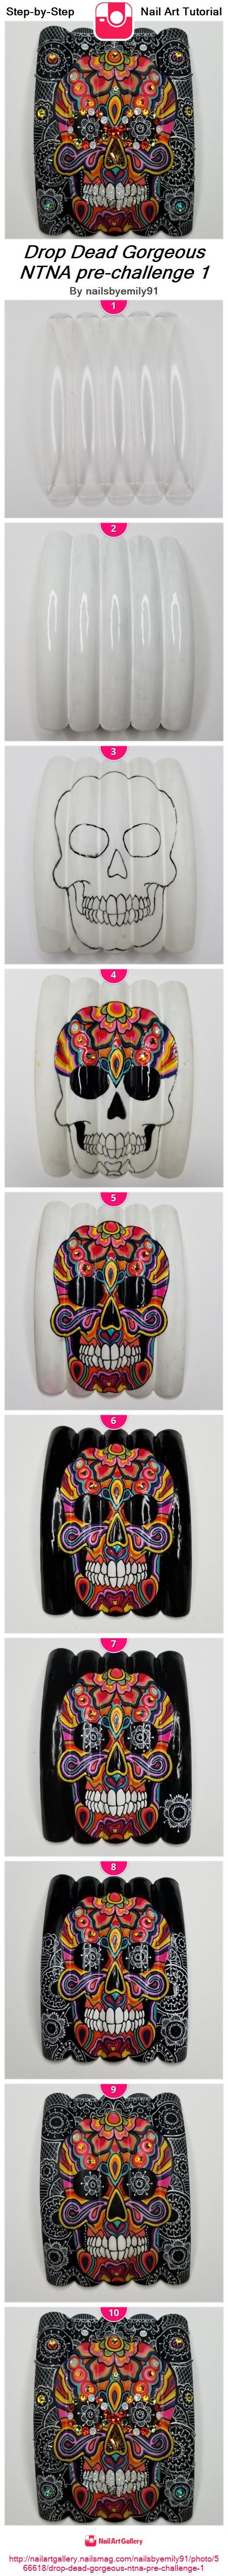 Drop Dead Gorgeous NTNA pre-challenge 1 - Nail Art Gallery